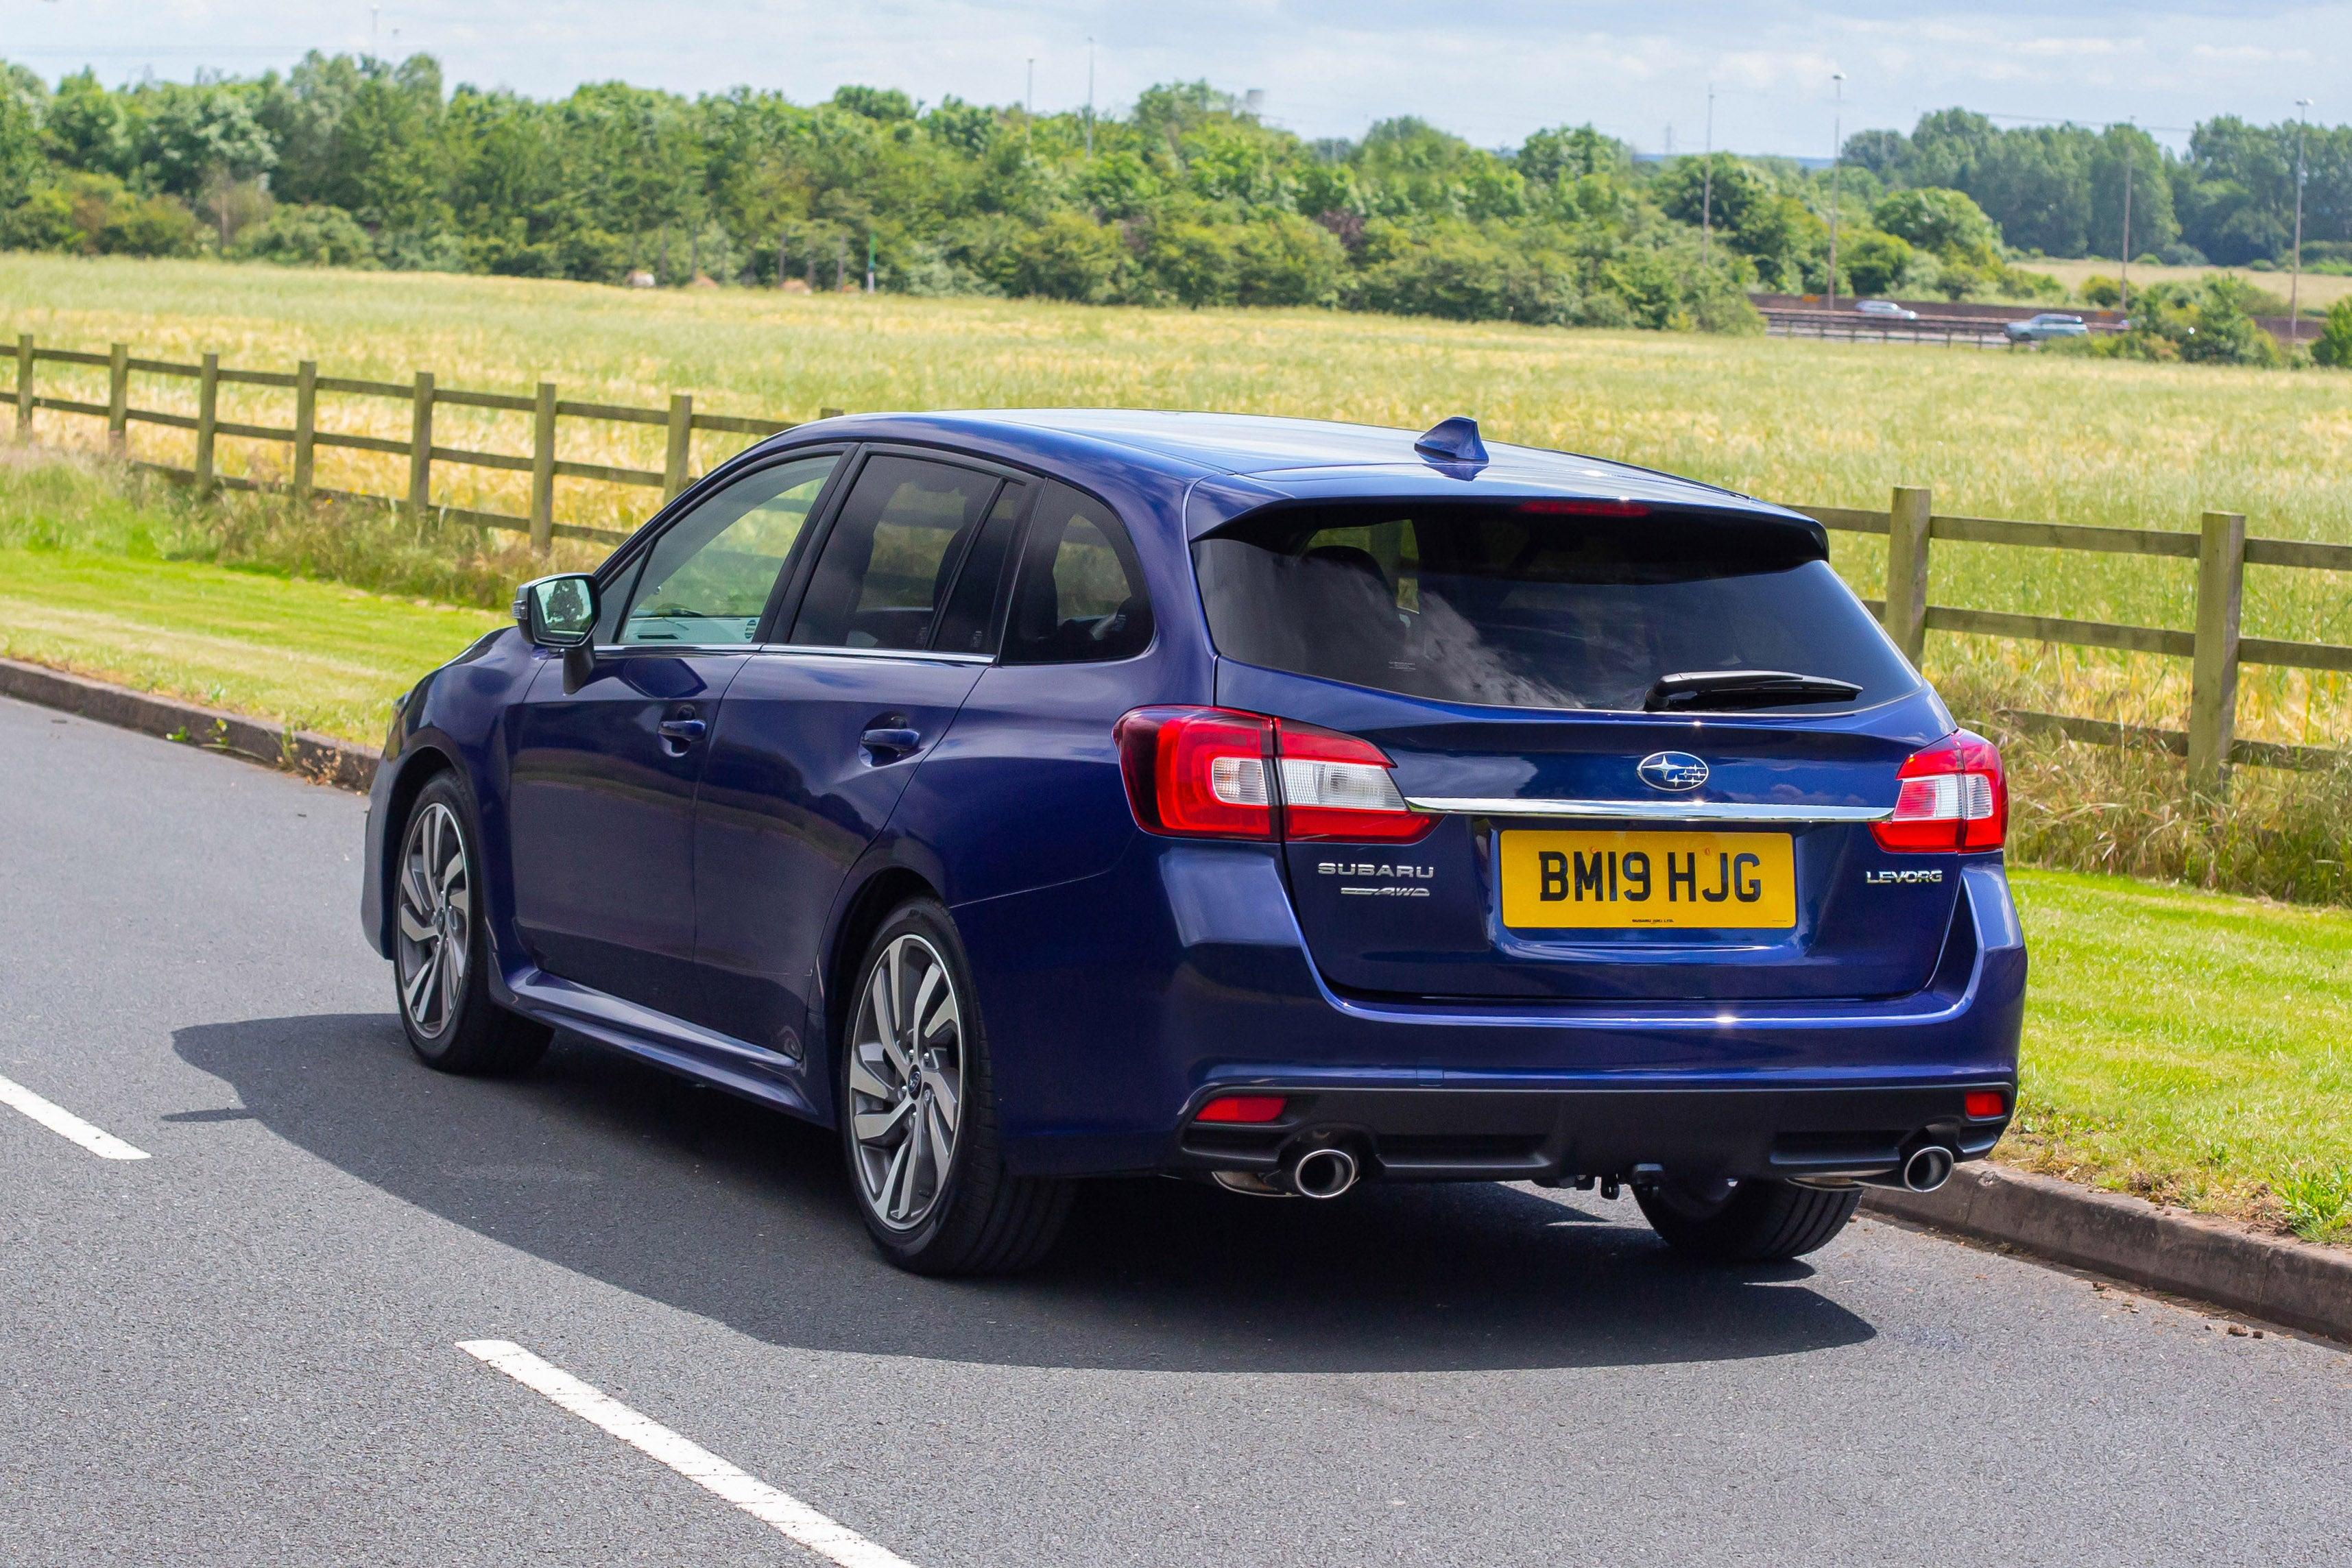 Subaru Levorg Side Rear View